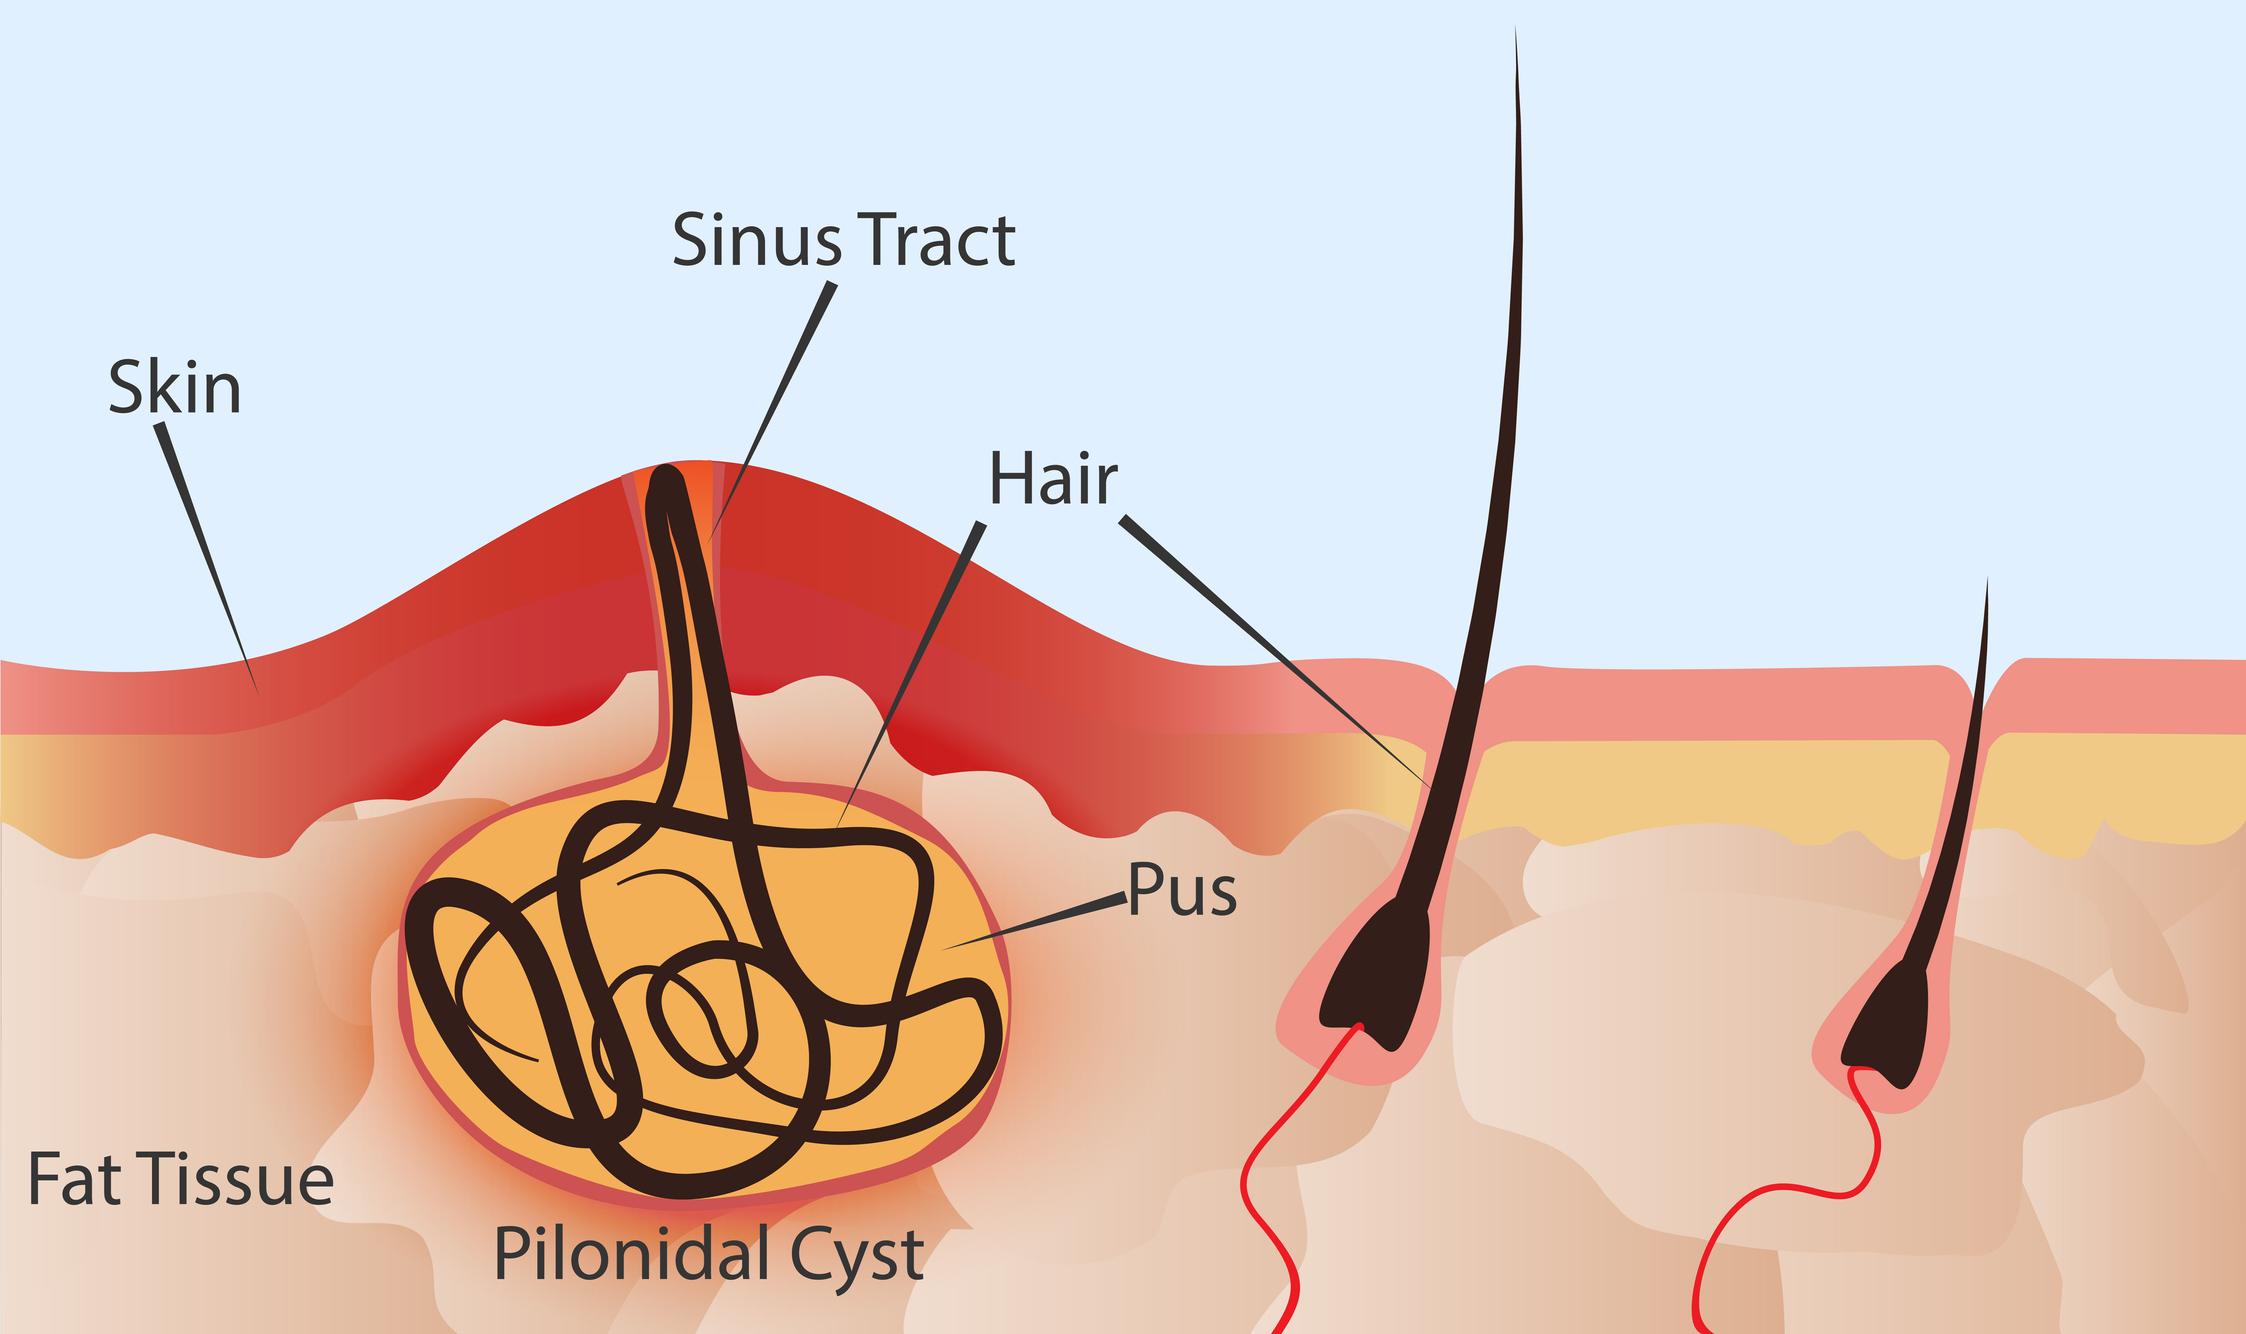 Pilonidal cyst diagram